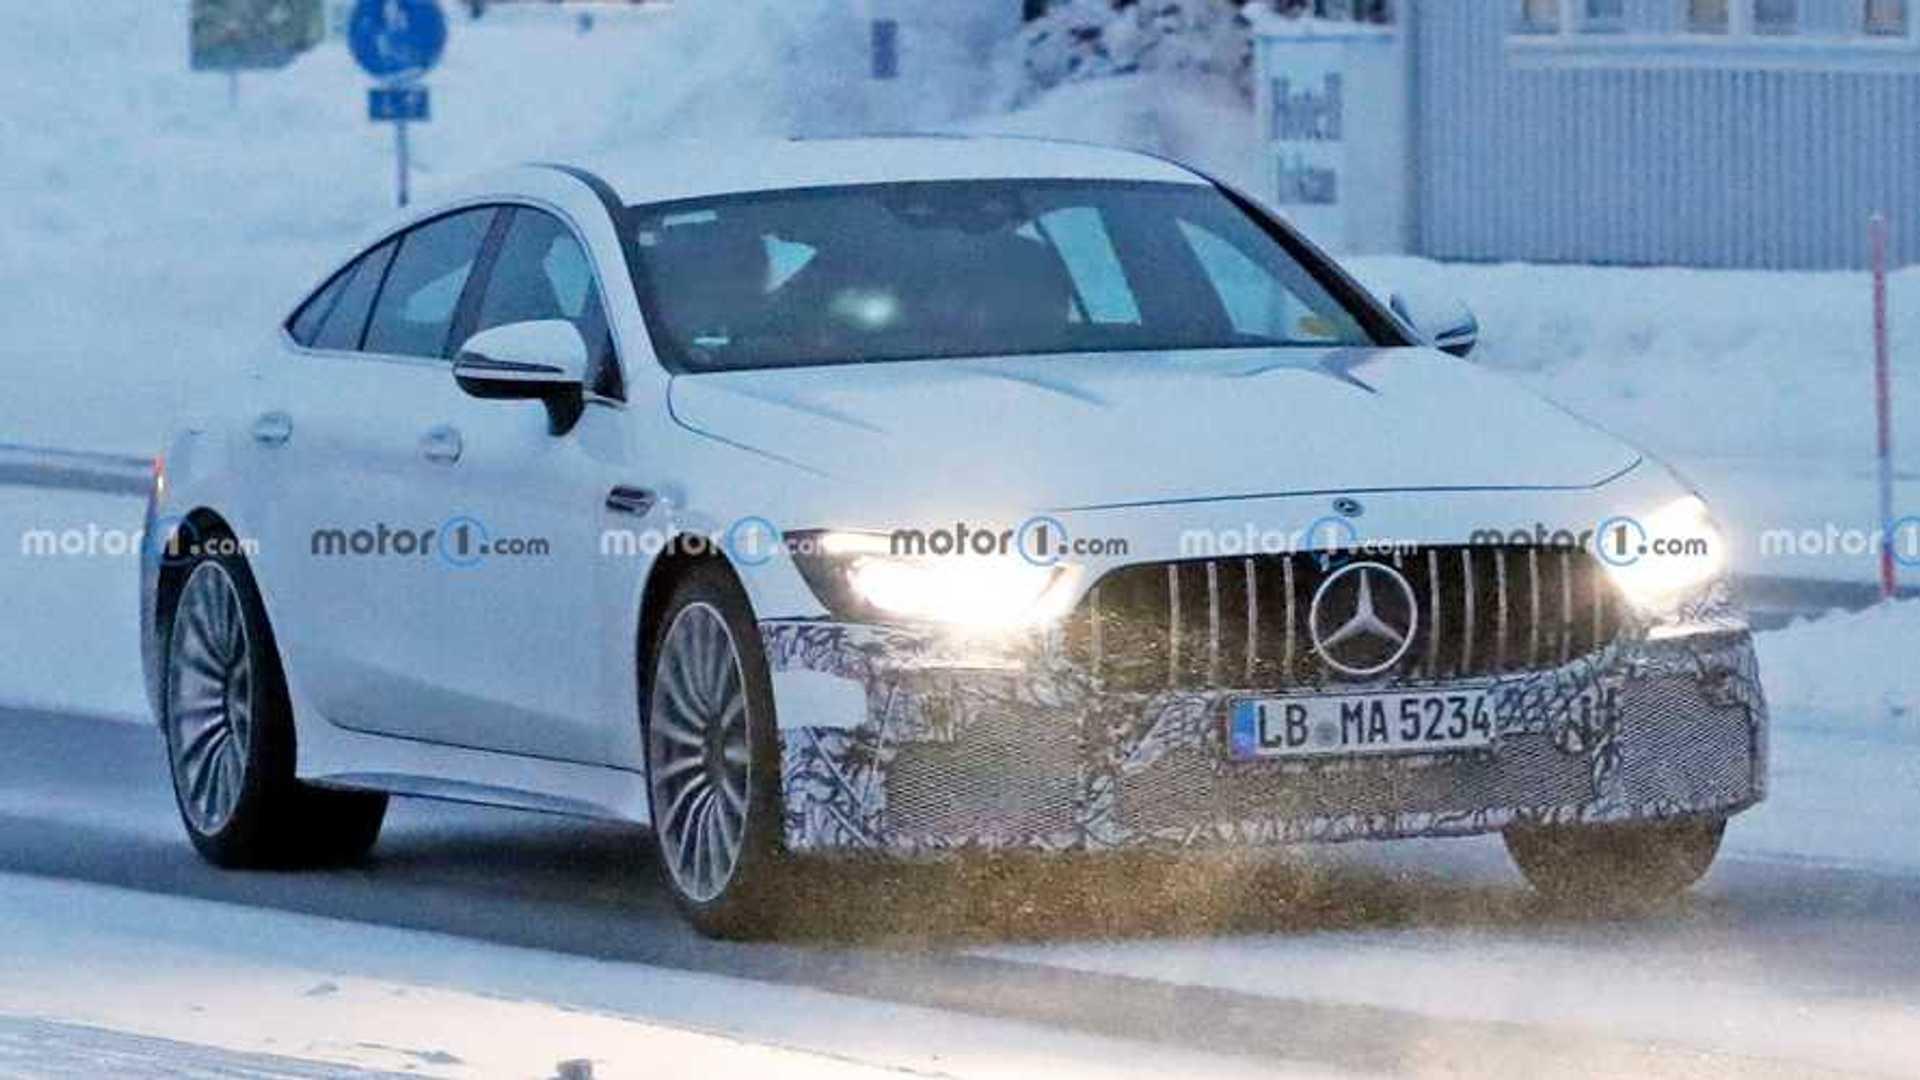 Mercedes-AMG GT73e Spy Shots Lights On